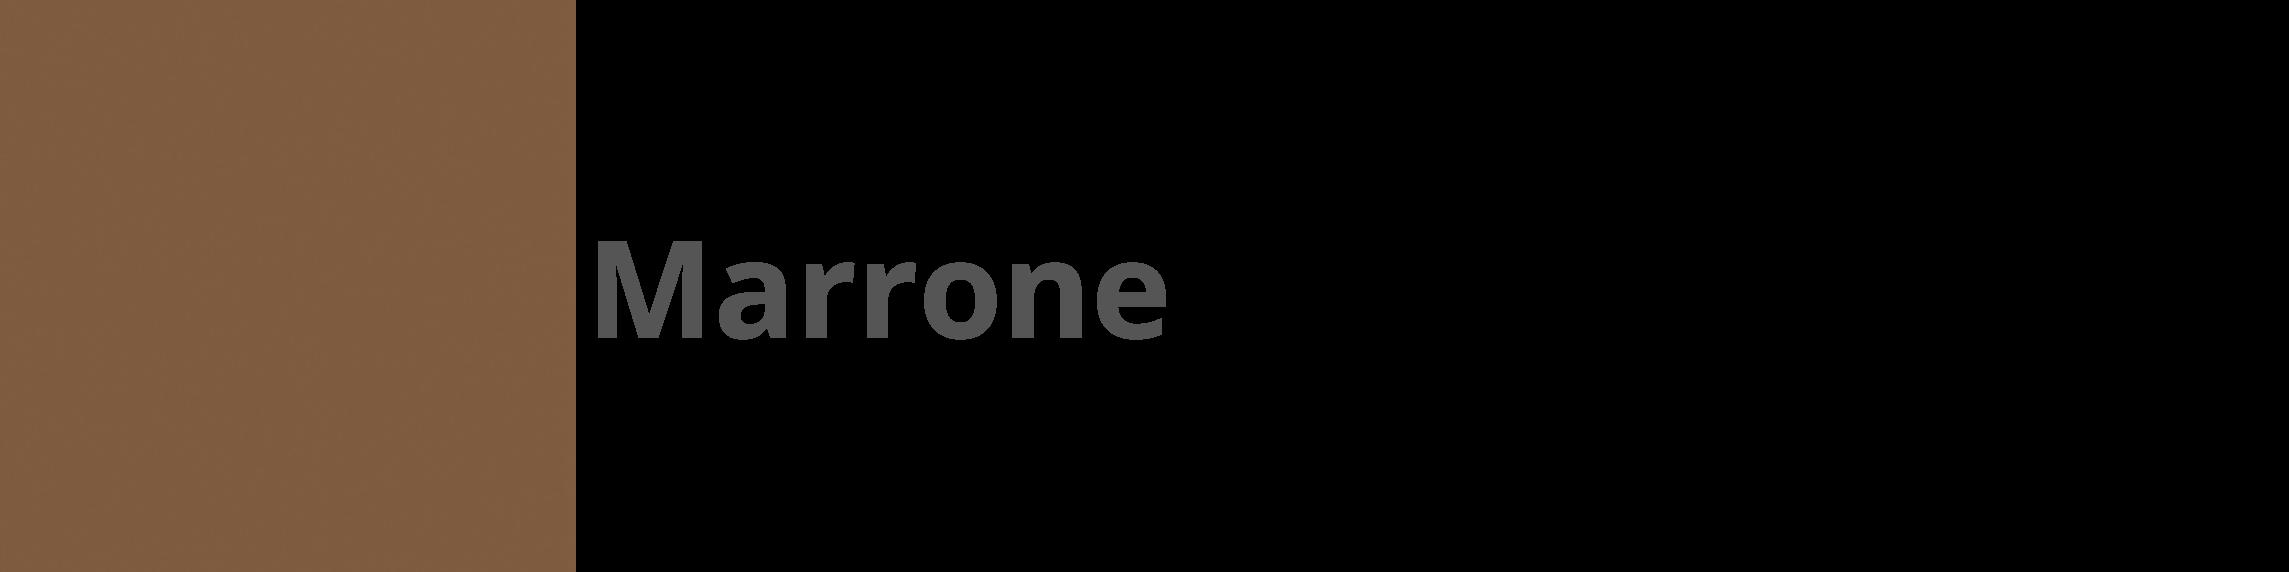 1271 Marrone